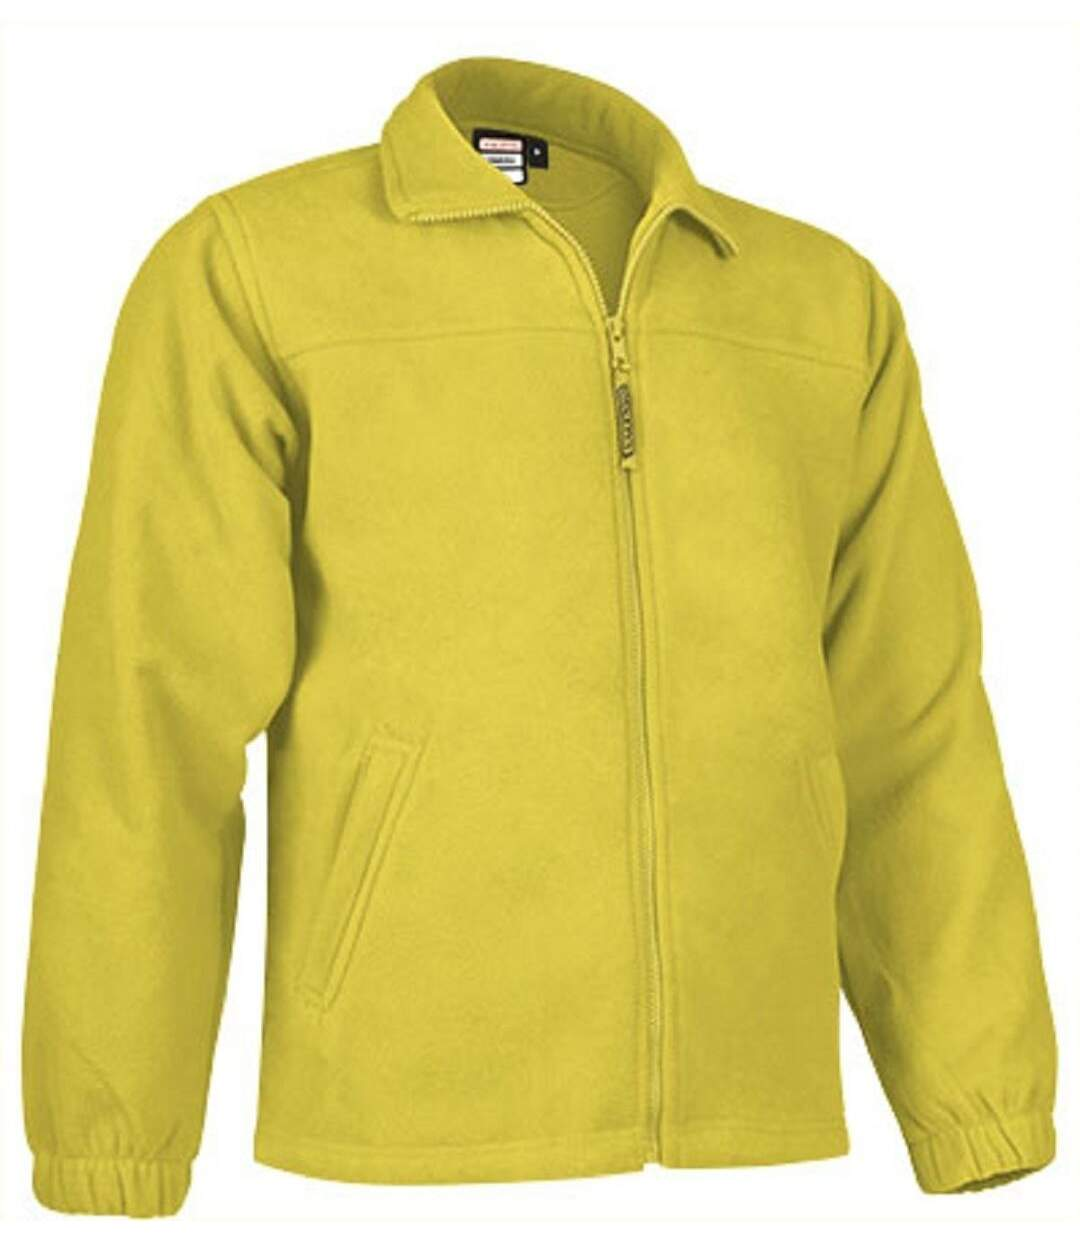 Veste polaire zippée - Homme - REF DAKOTA - jaune citron